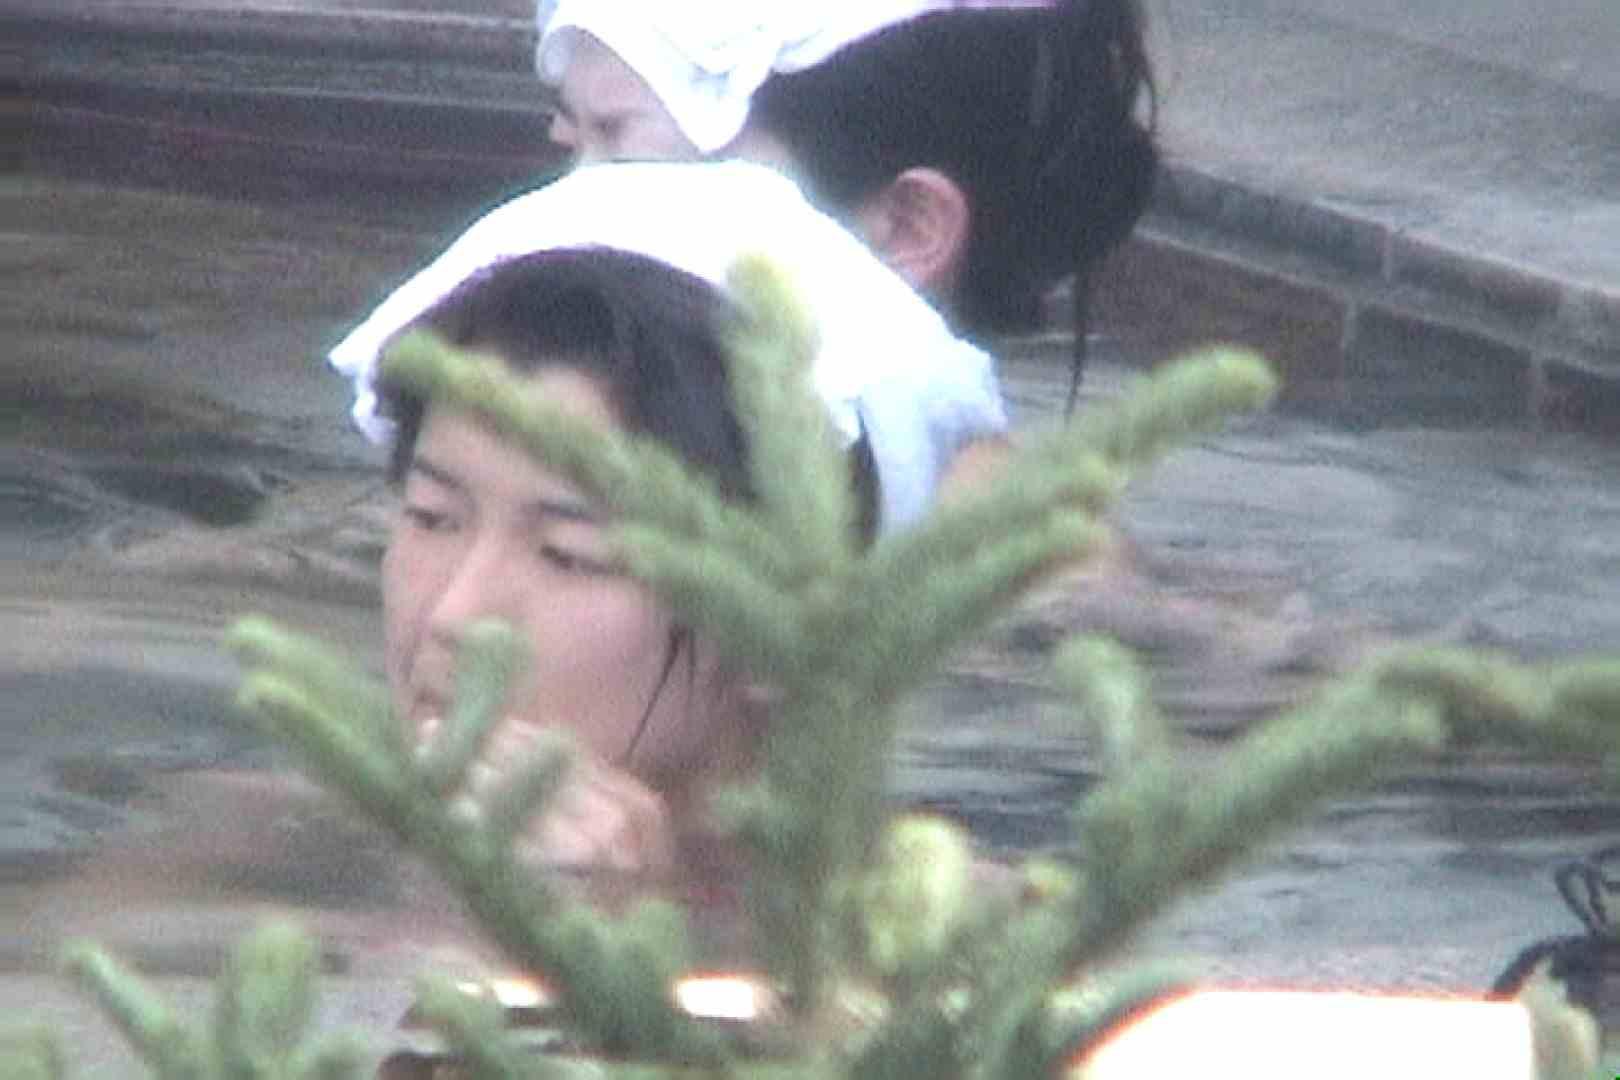 Aquaな露天風呂Vol.80【VIP限定】 露天風呂編   盗撮シリーズ  76PIX 65